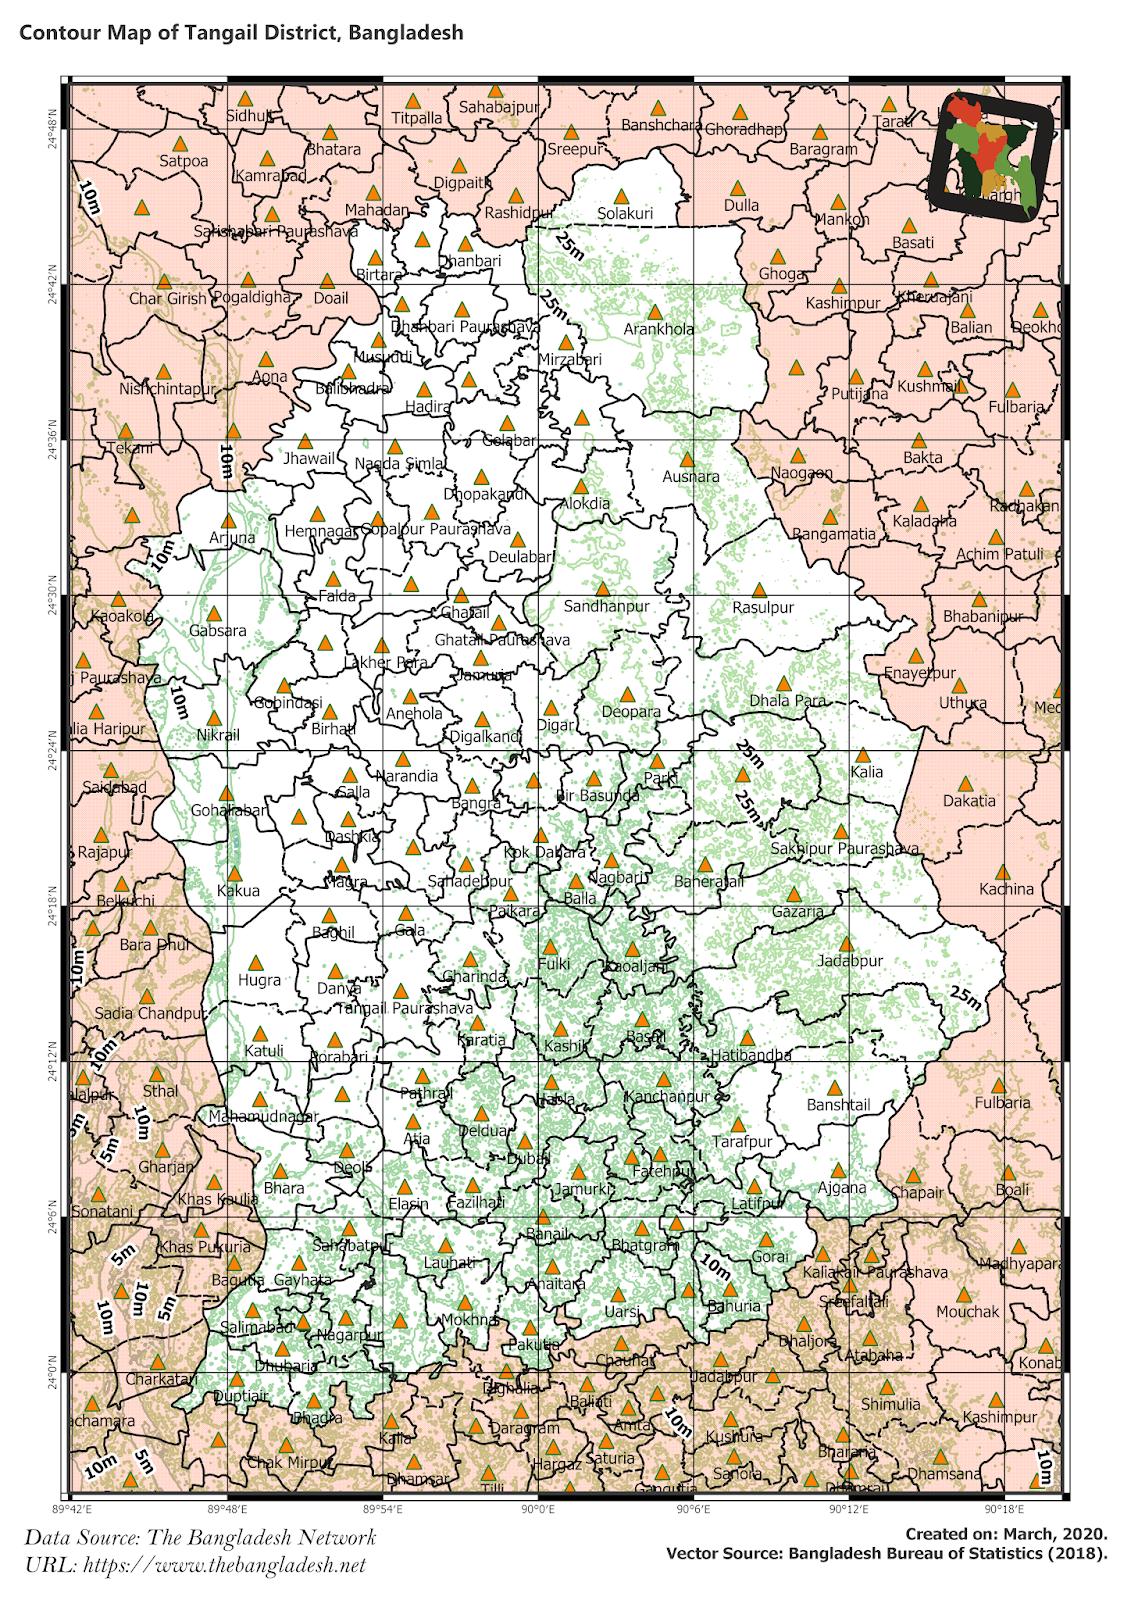 Elevation Map of Tangail District of Bangladesh